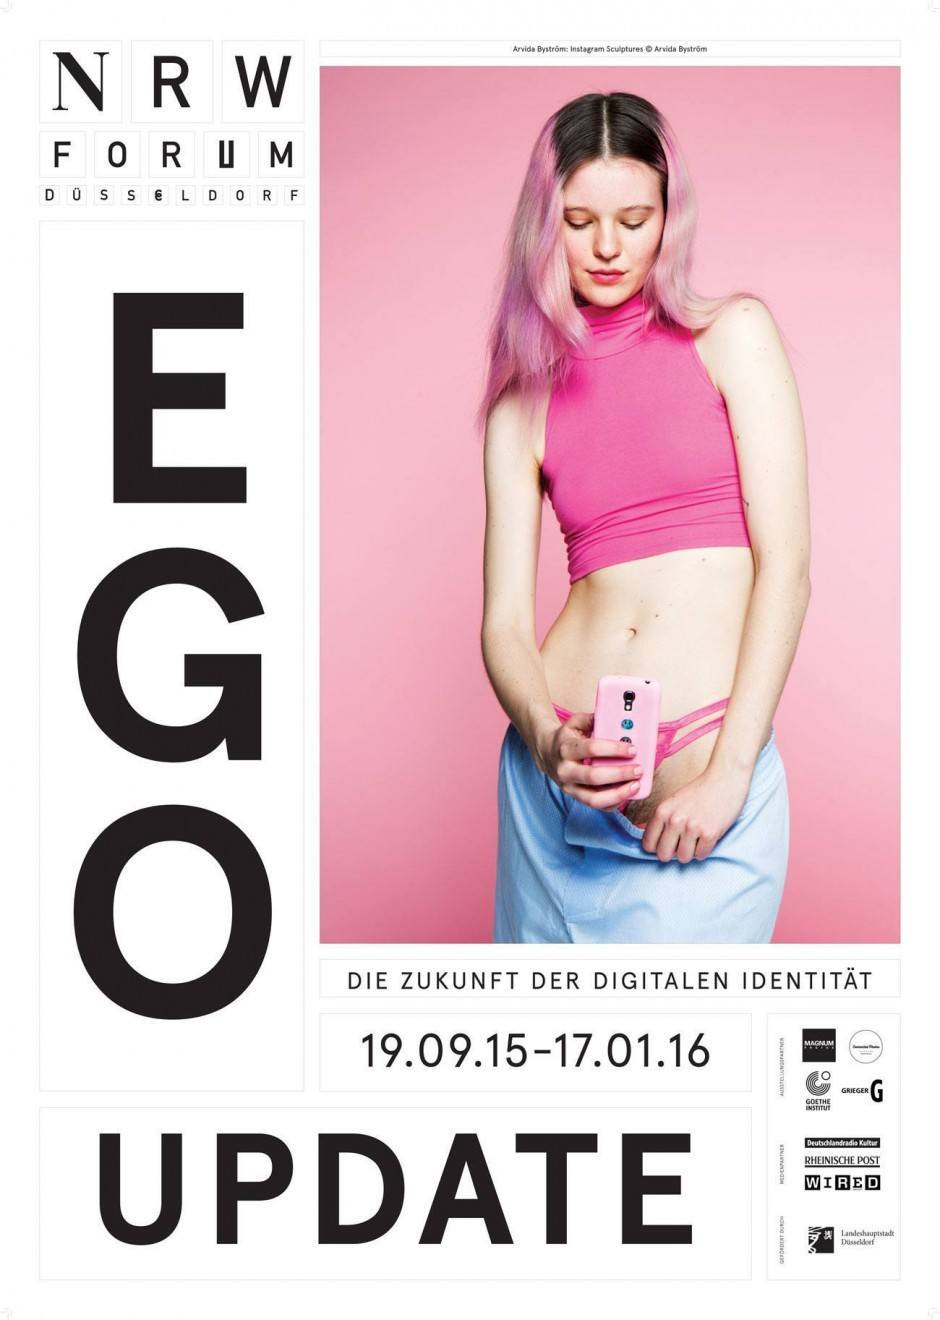 http://page-online.de/wp-content/uploads/2015/09/KR_150909_NRW-Forum_Neues-CD_EGO-UPDATE_Postkarten_01-940x1320.jpg